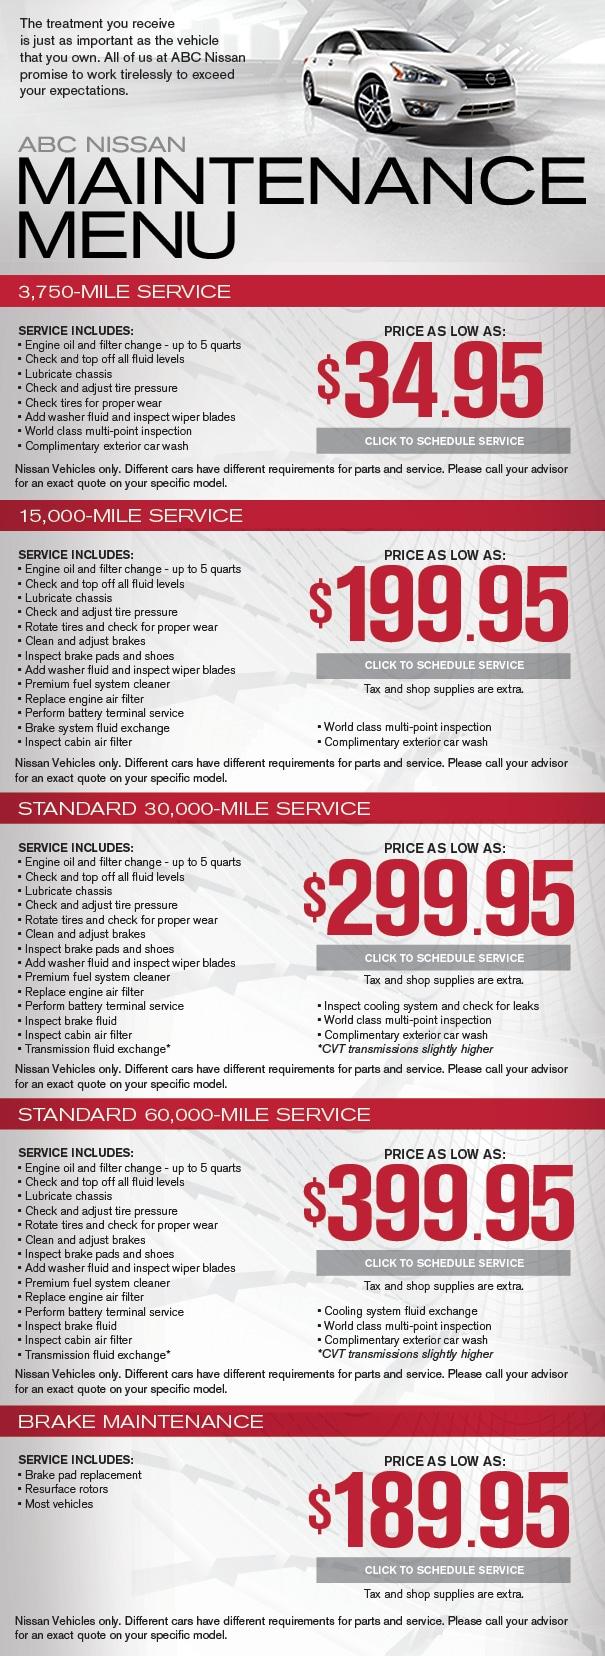 Nissan Car Service Amp Repairs Phoenix Maintenance Guide